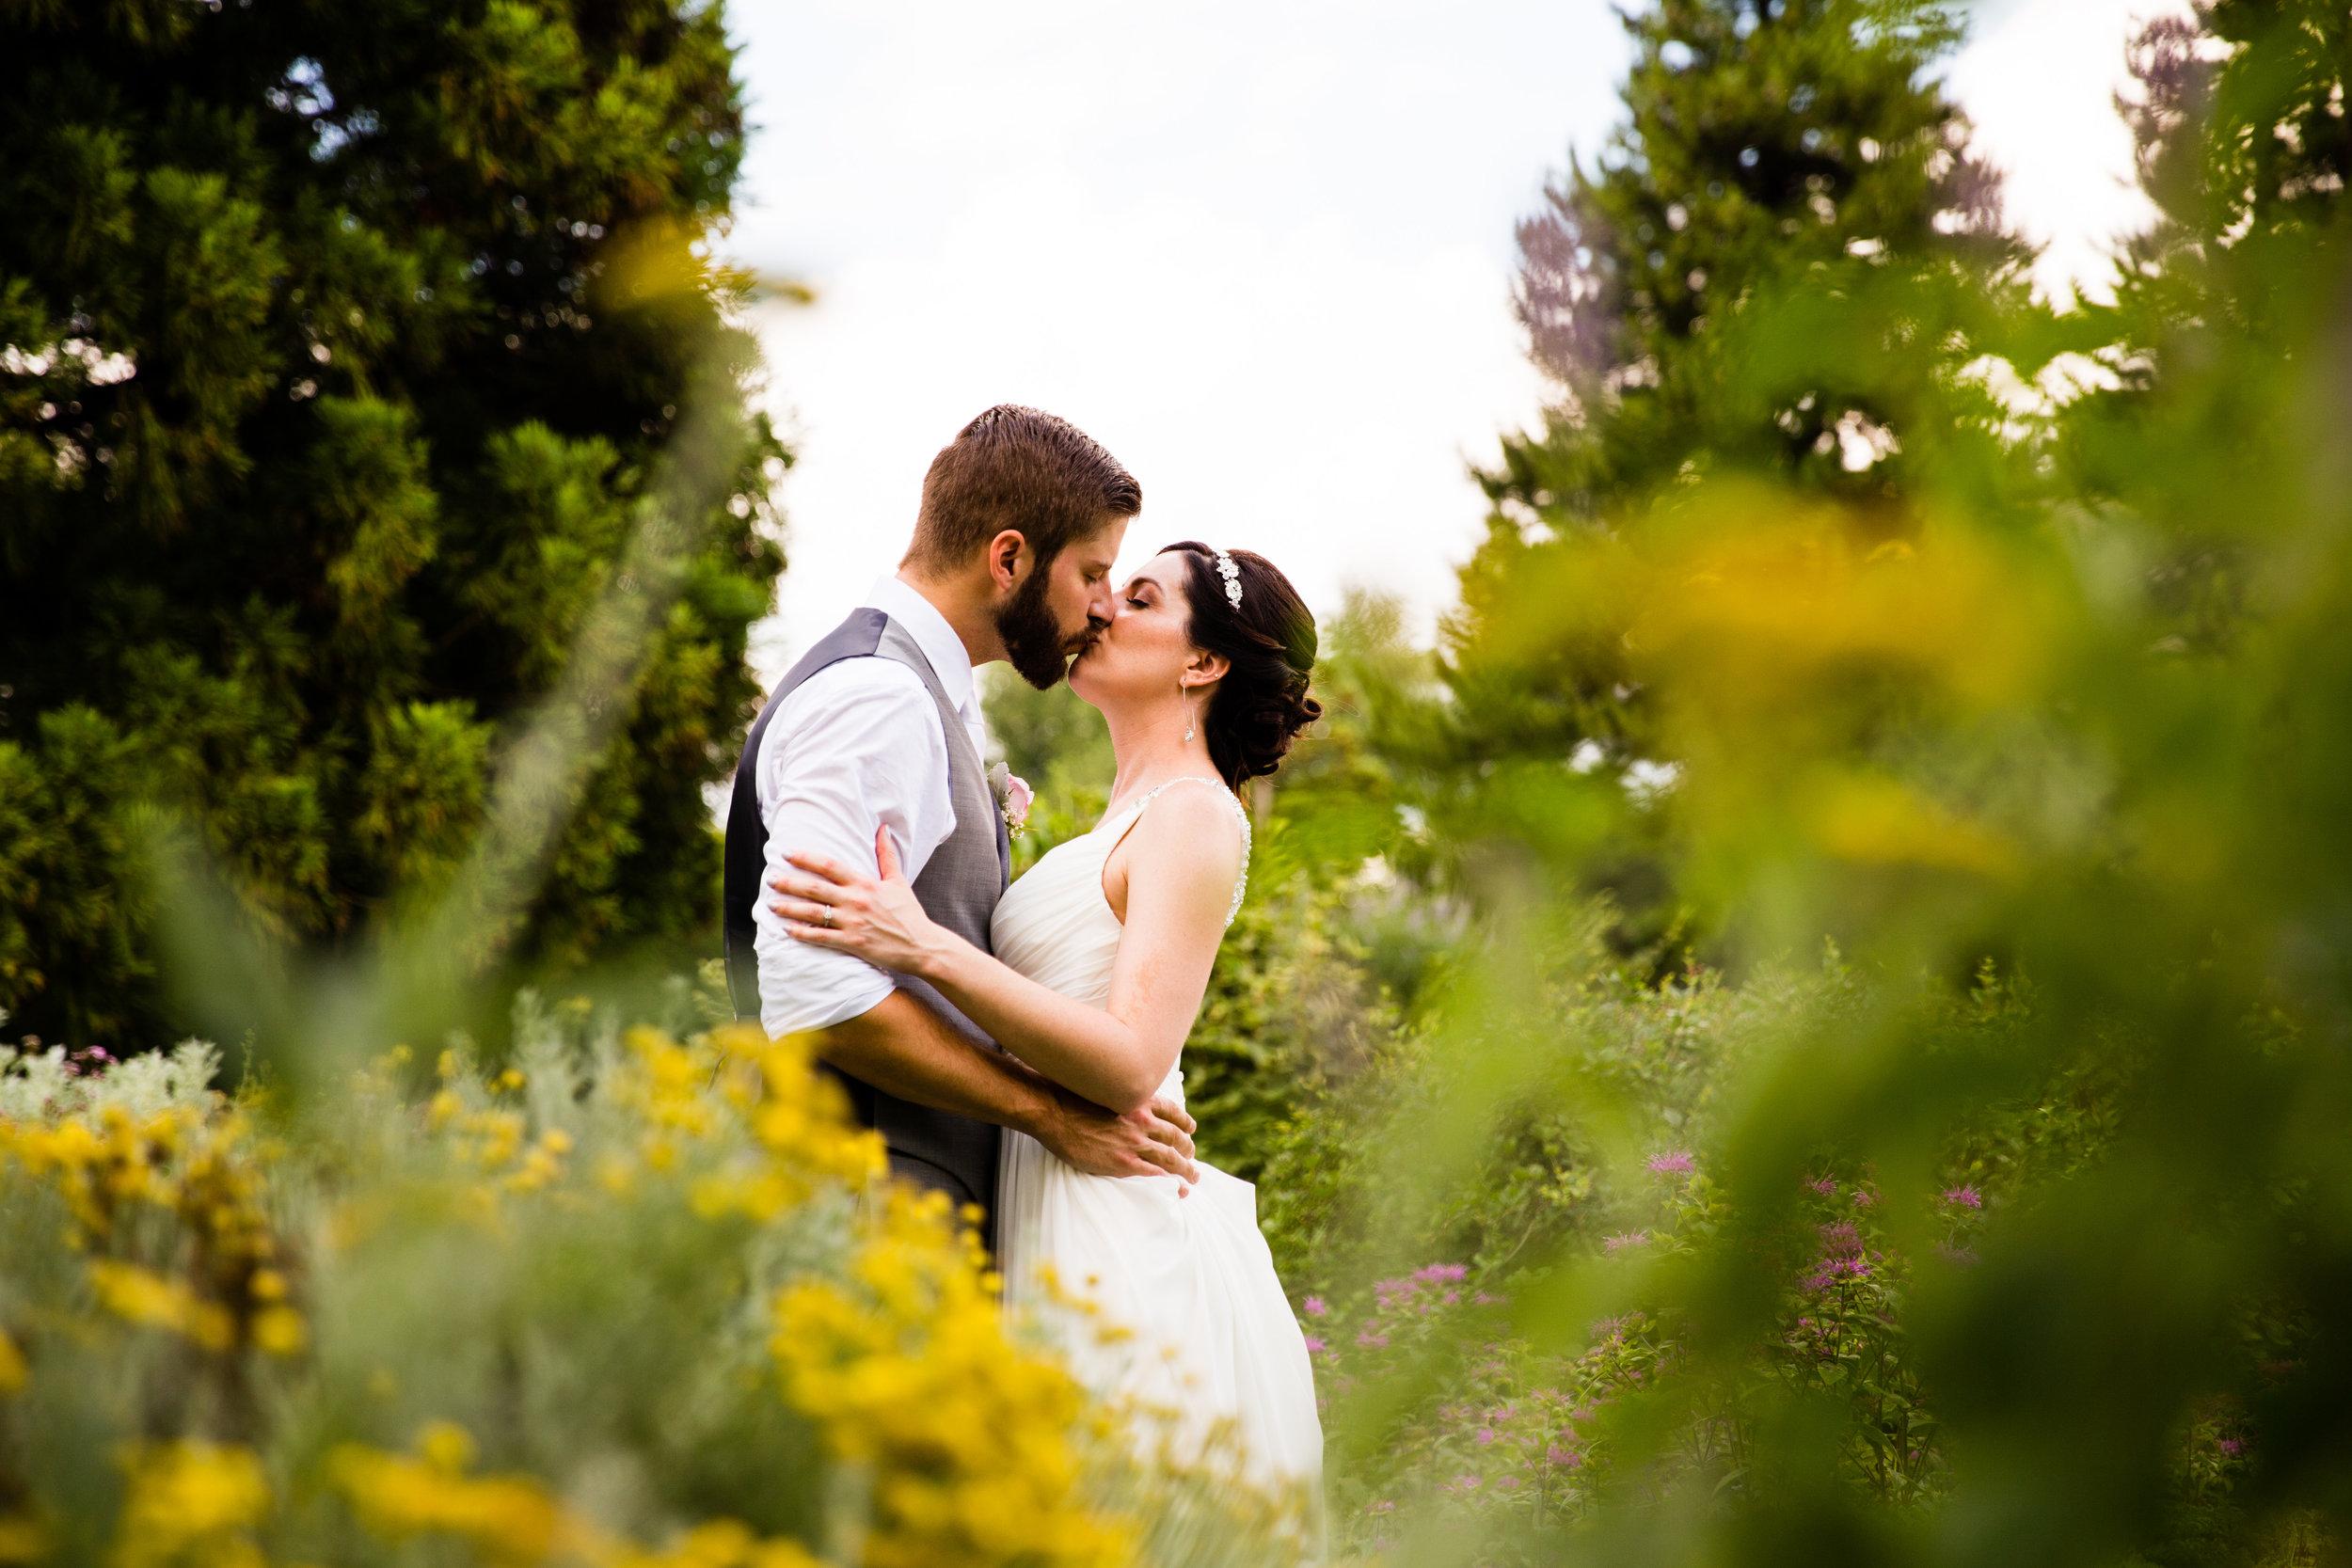 TYLER ARBORETUM WEDDING PHOTOGRAPHY LOVESTRUCK PICTURES-039.jpg